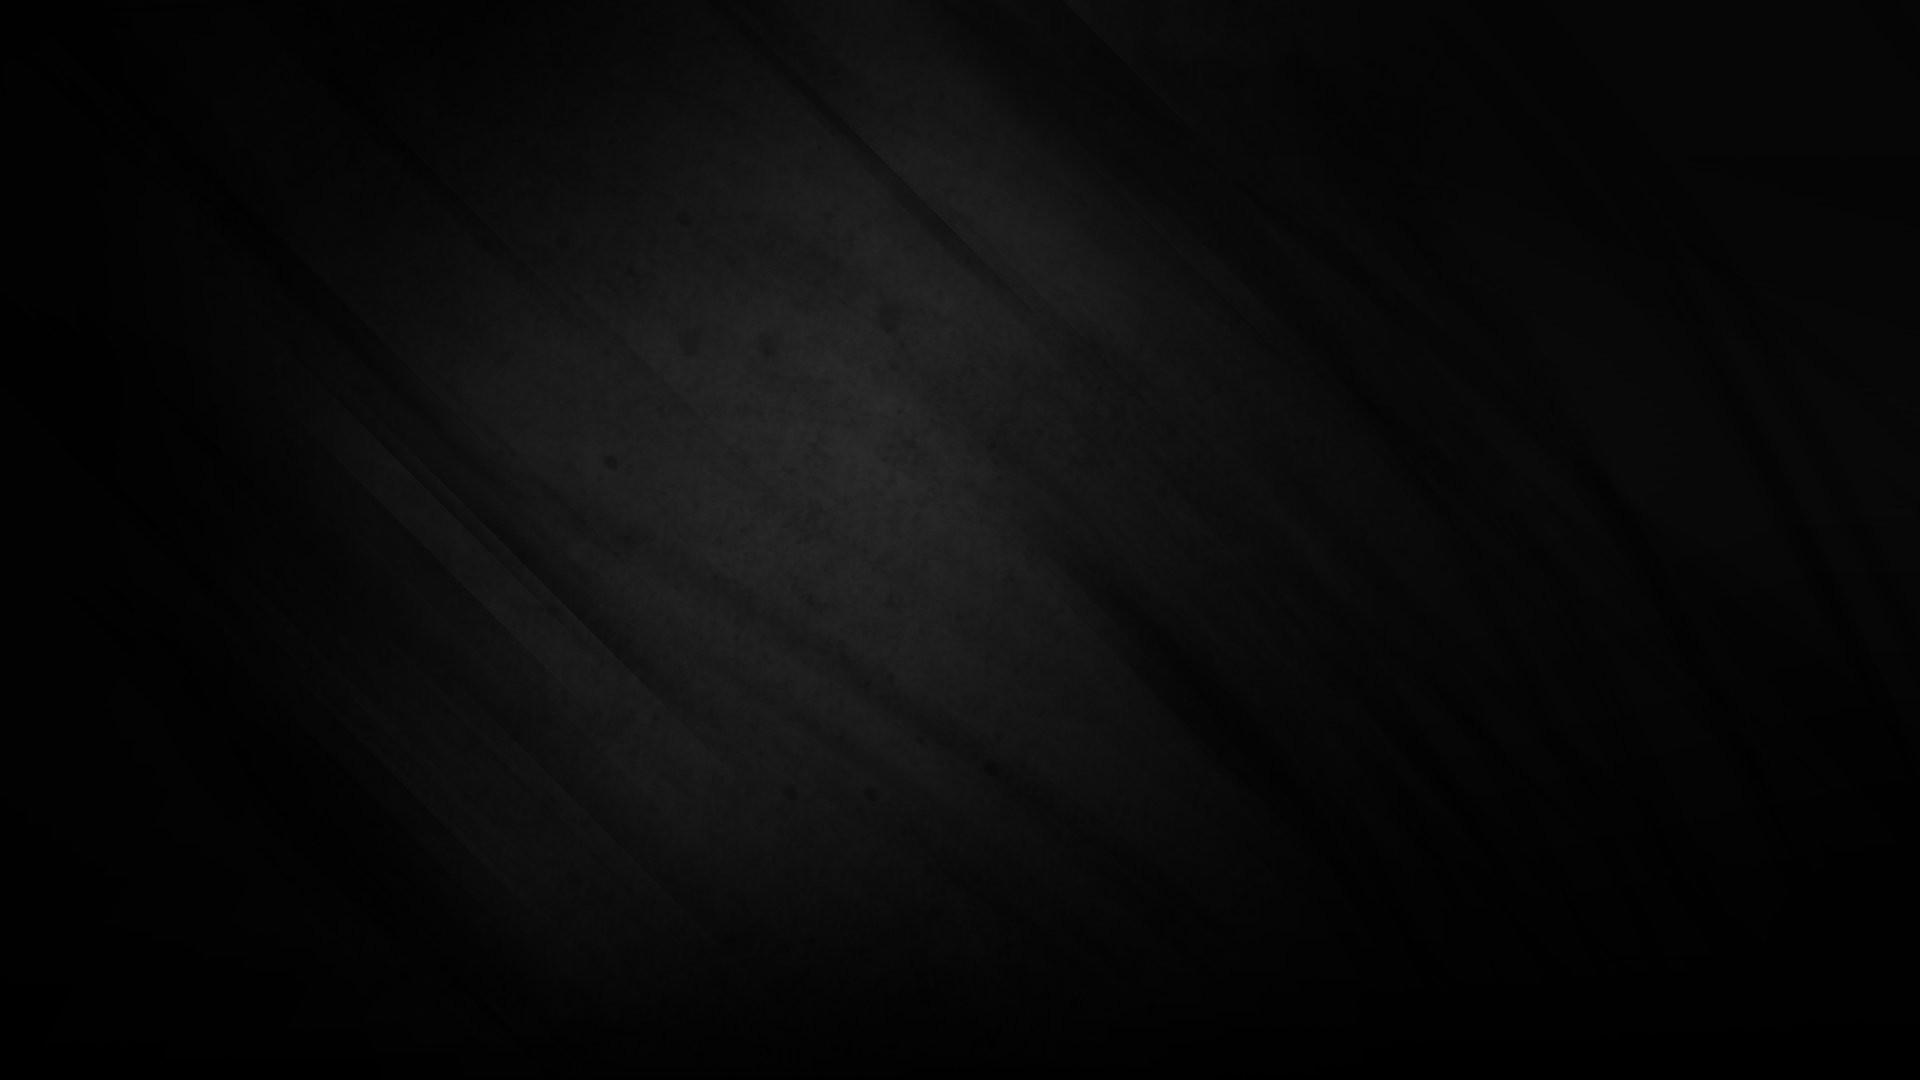 Pretty Black Background Wallpapertag